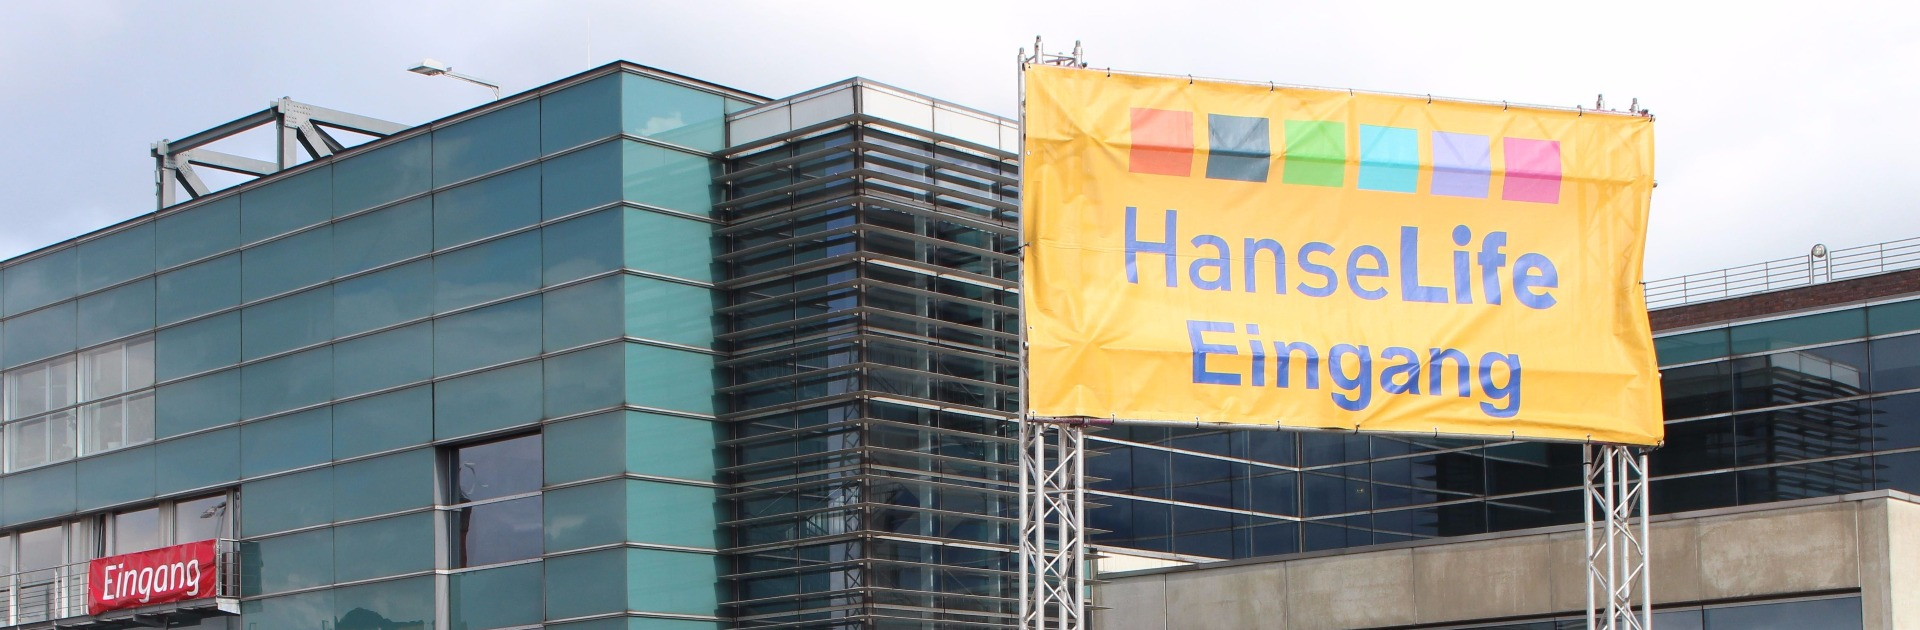 HanseLife, Bremen, Messe, InVita